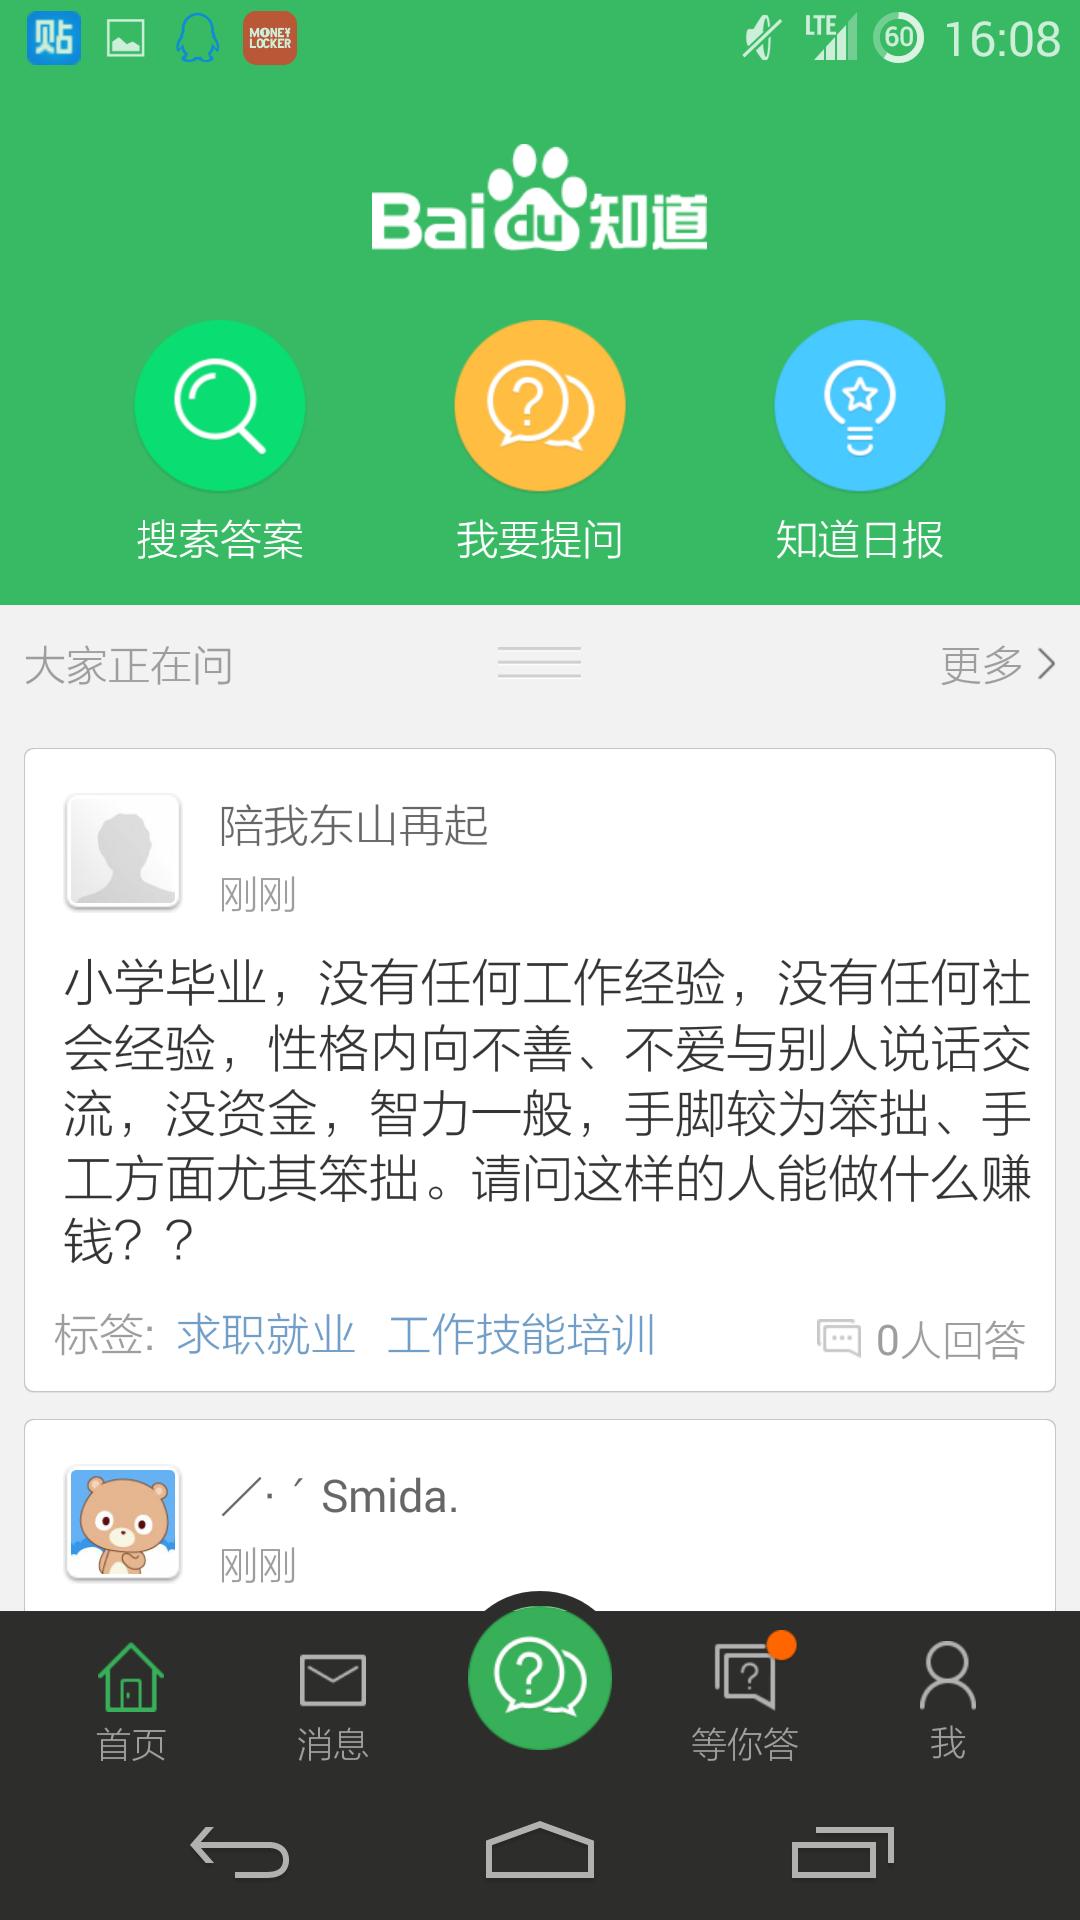 Screenshot_2013-09-17-16-08-31.png